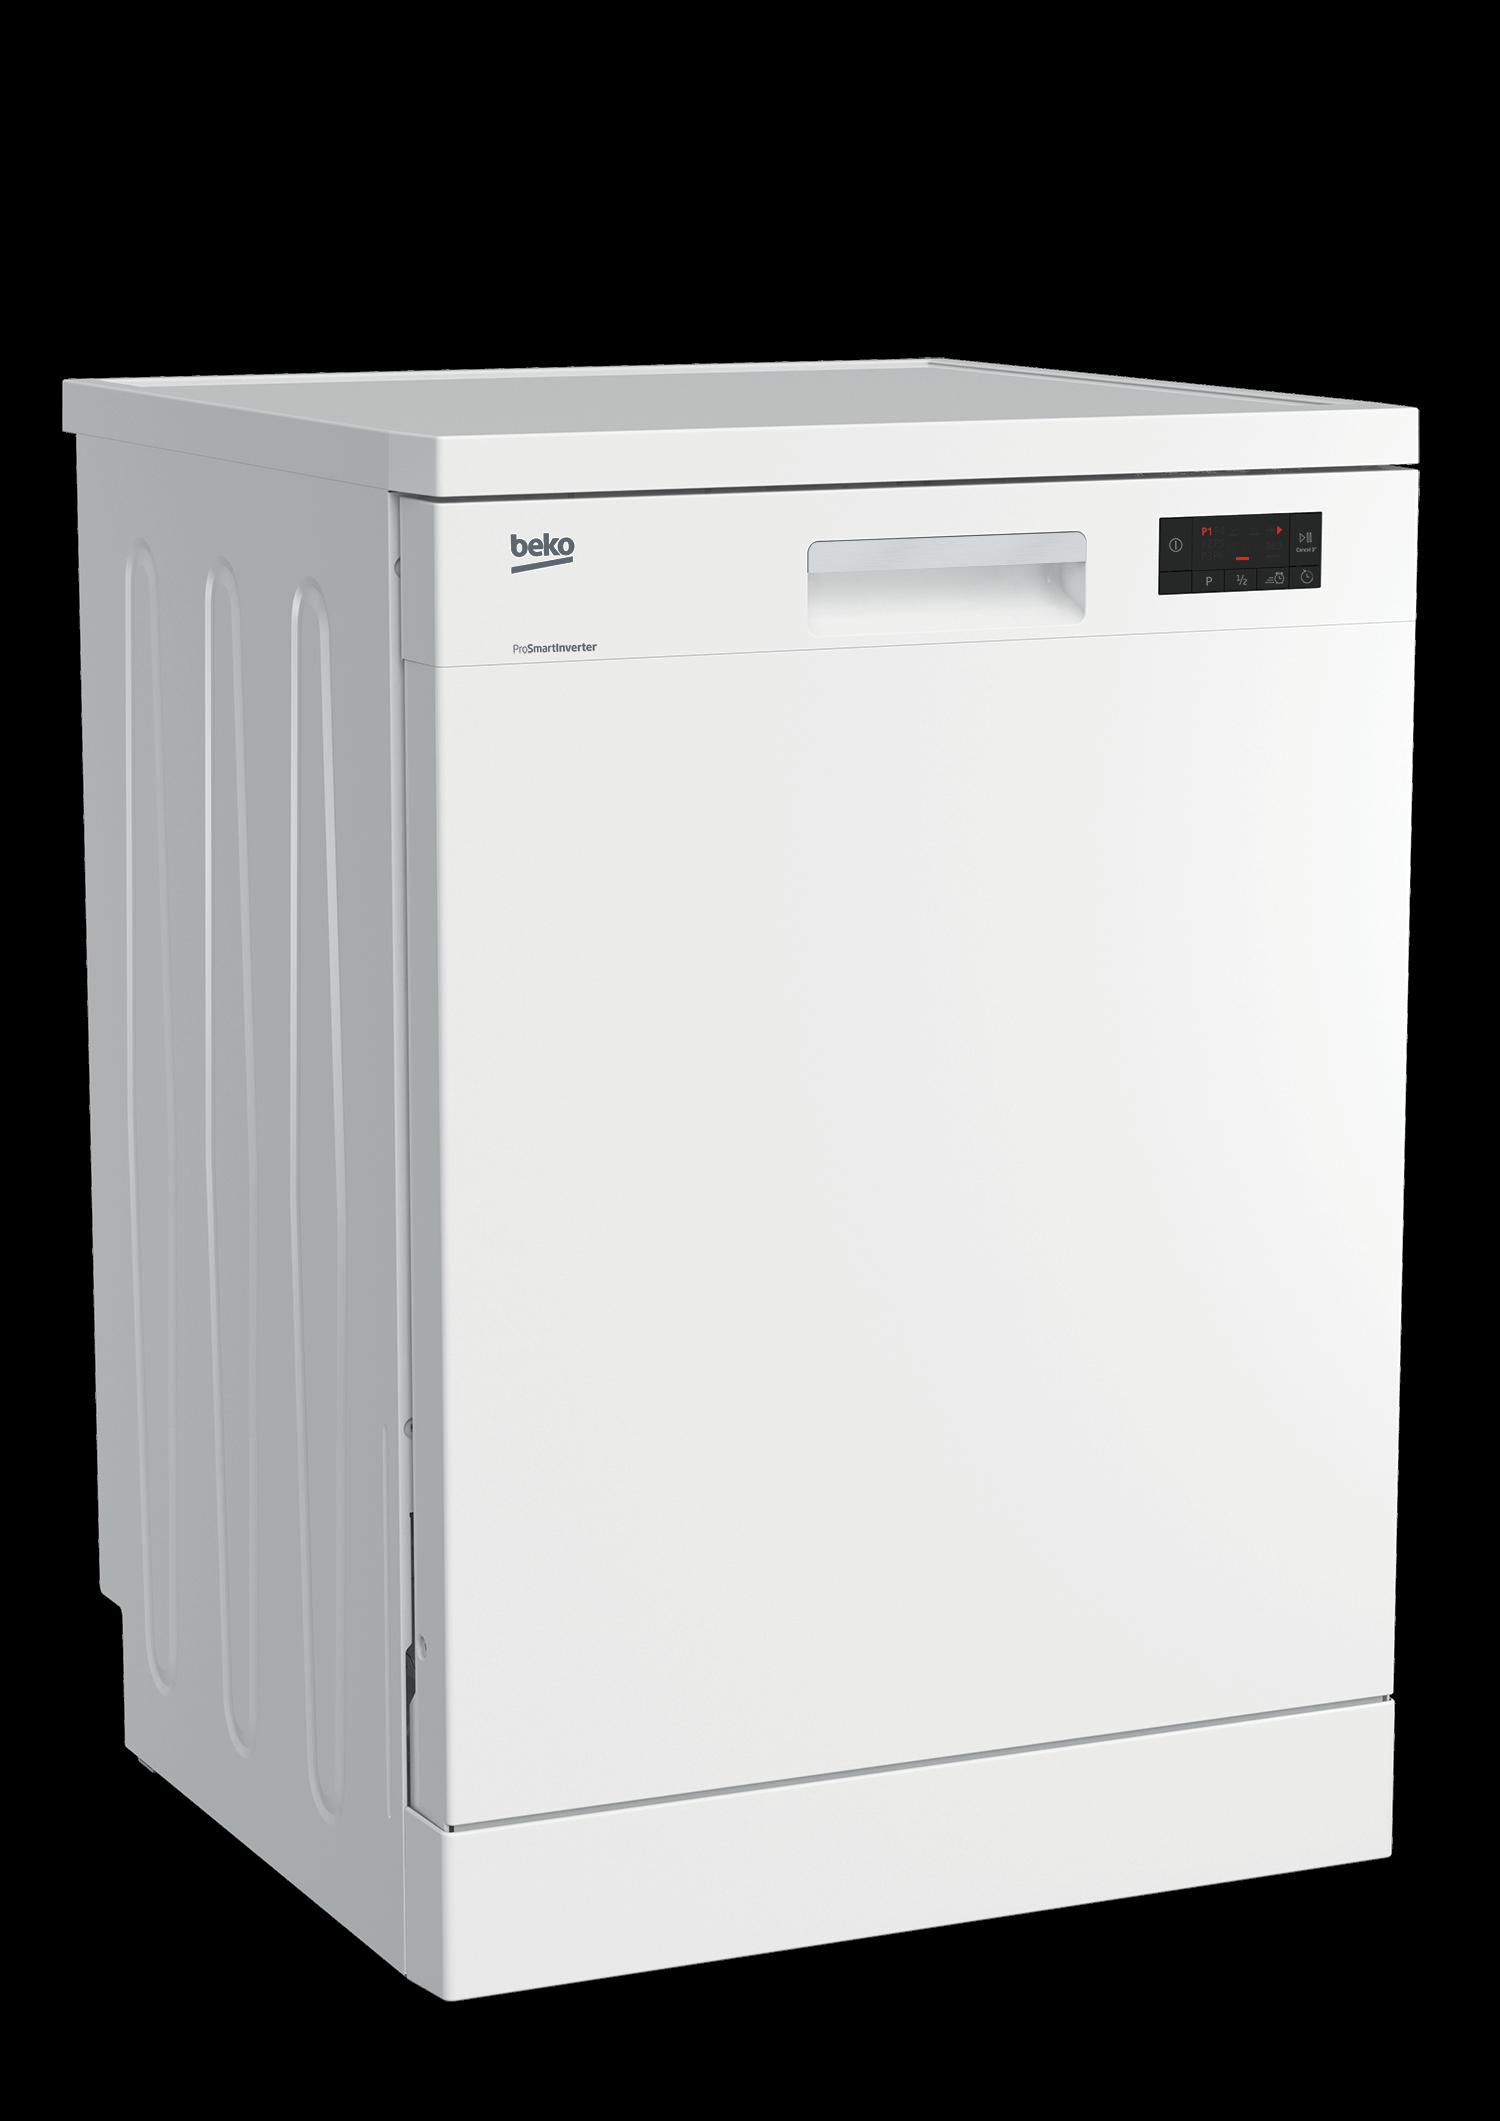 BEKO 6 Programmes Dishwasher DFN16421W